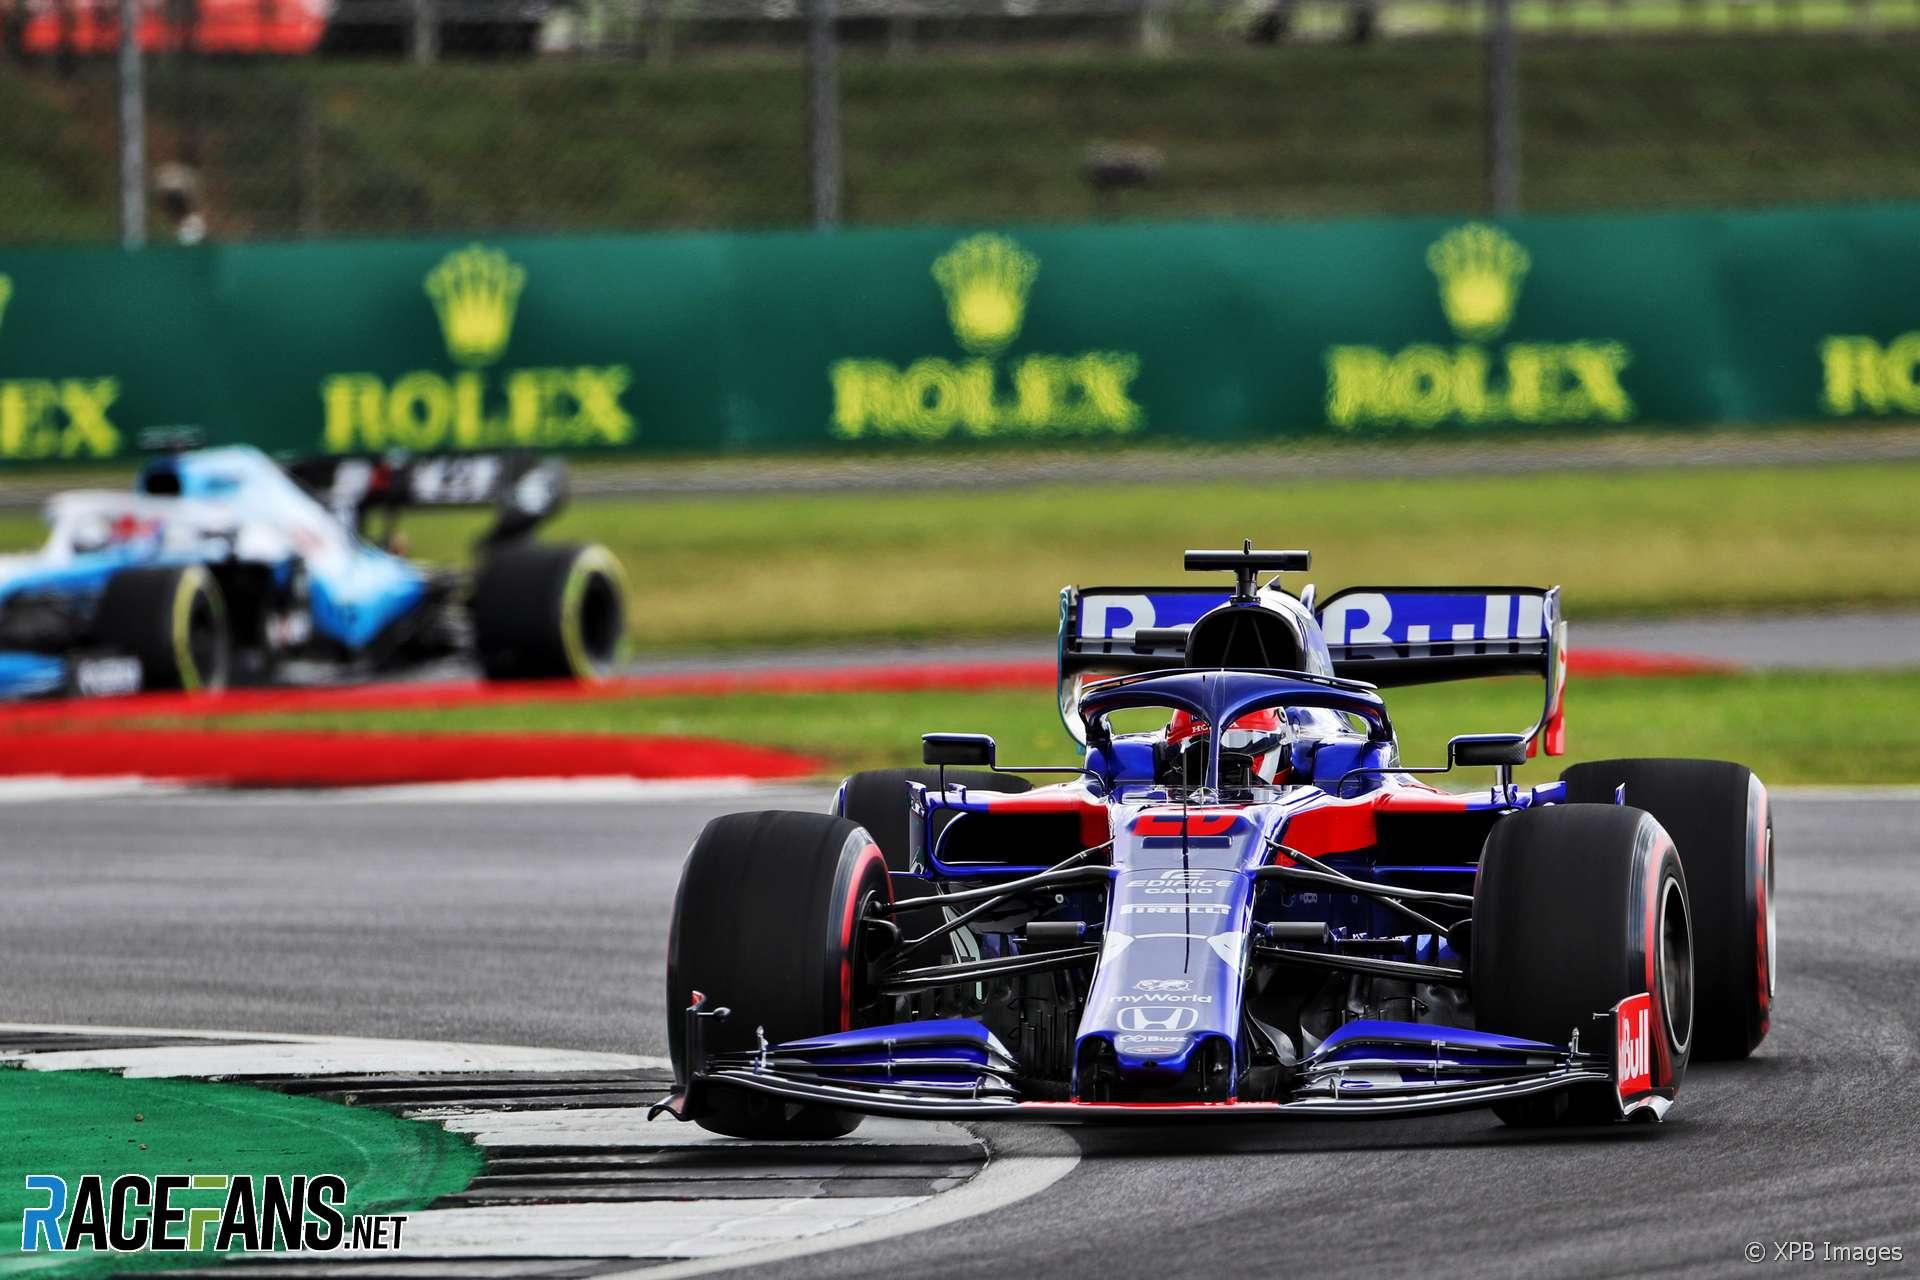 Daniil Kvyat, Toro Rosso, Silverstone, 2019